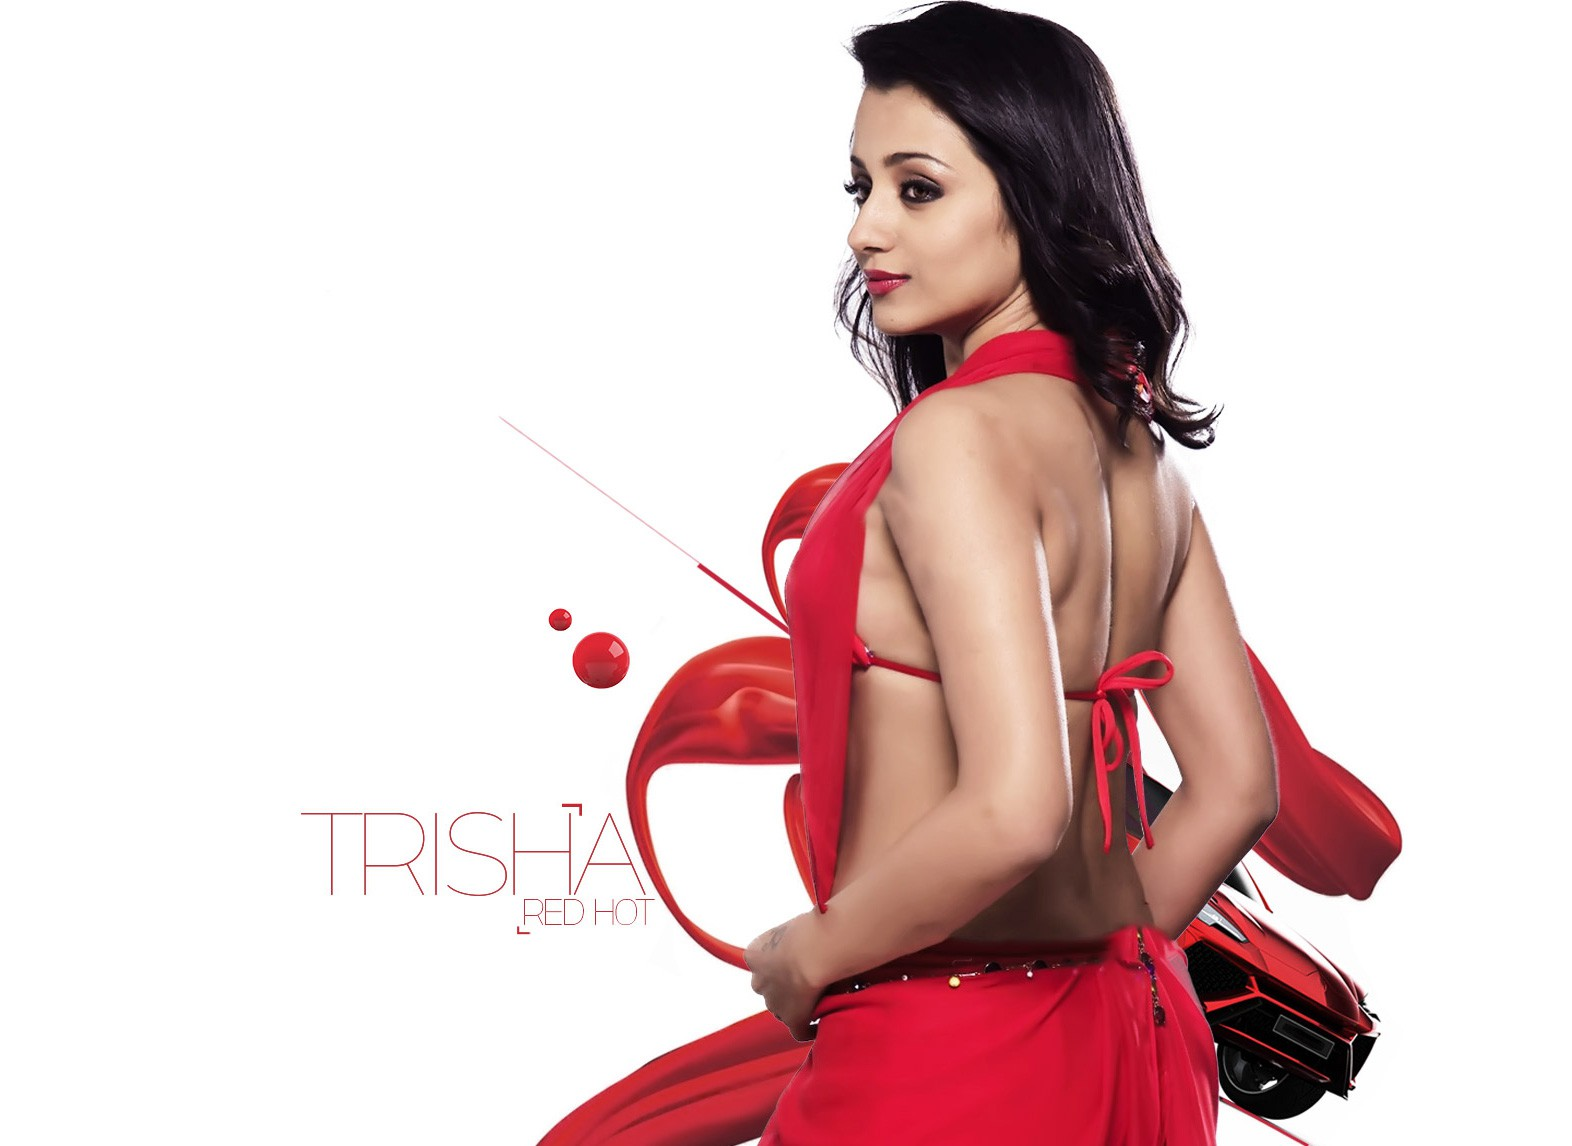 Trisha backless red dress hot hd wallpapers